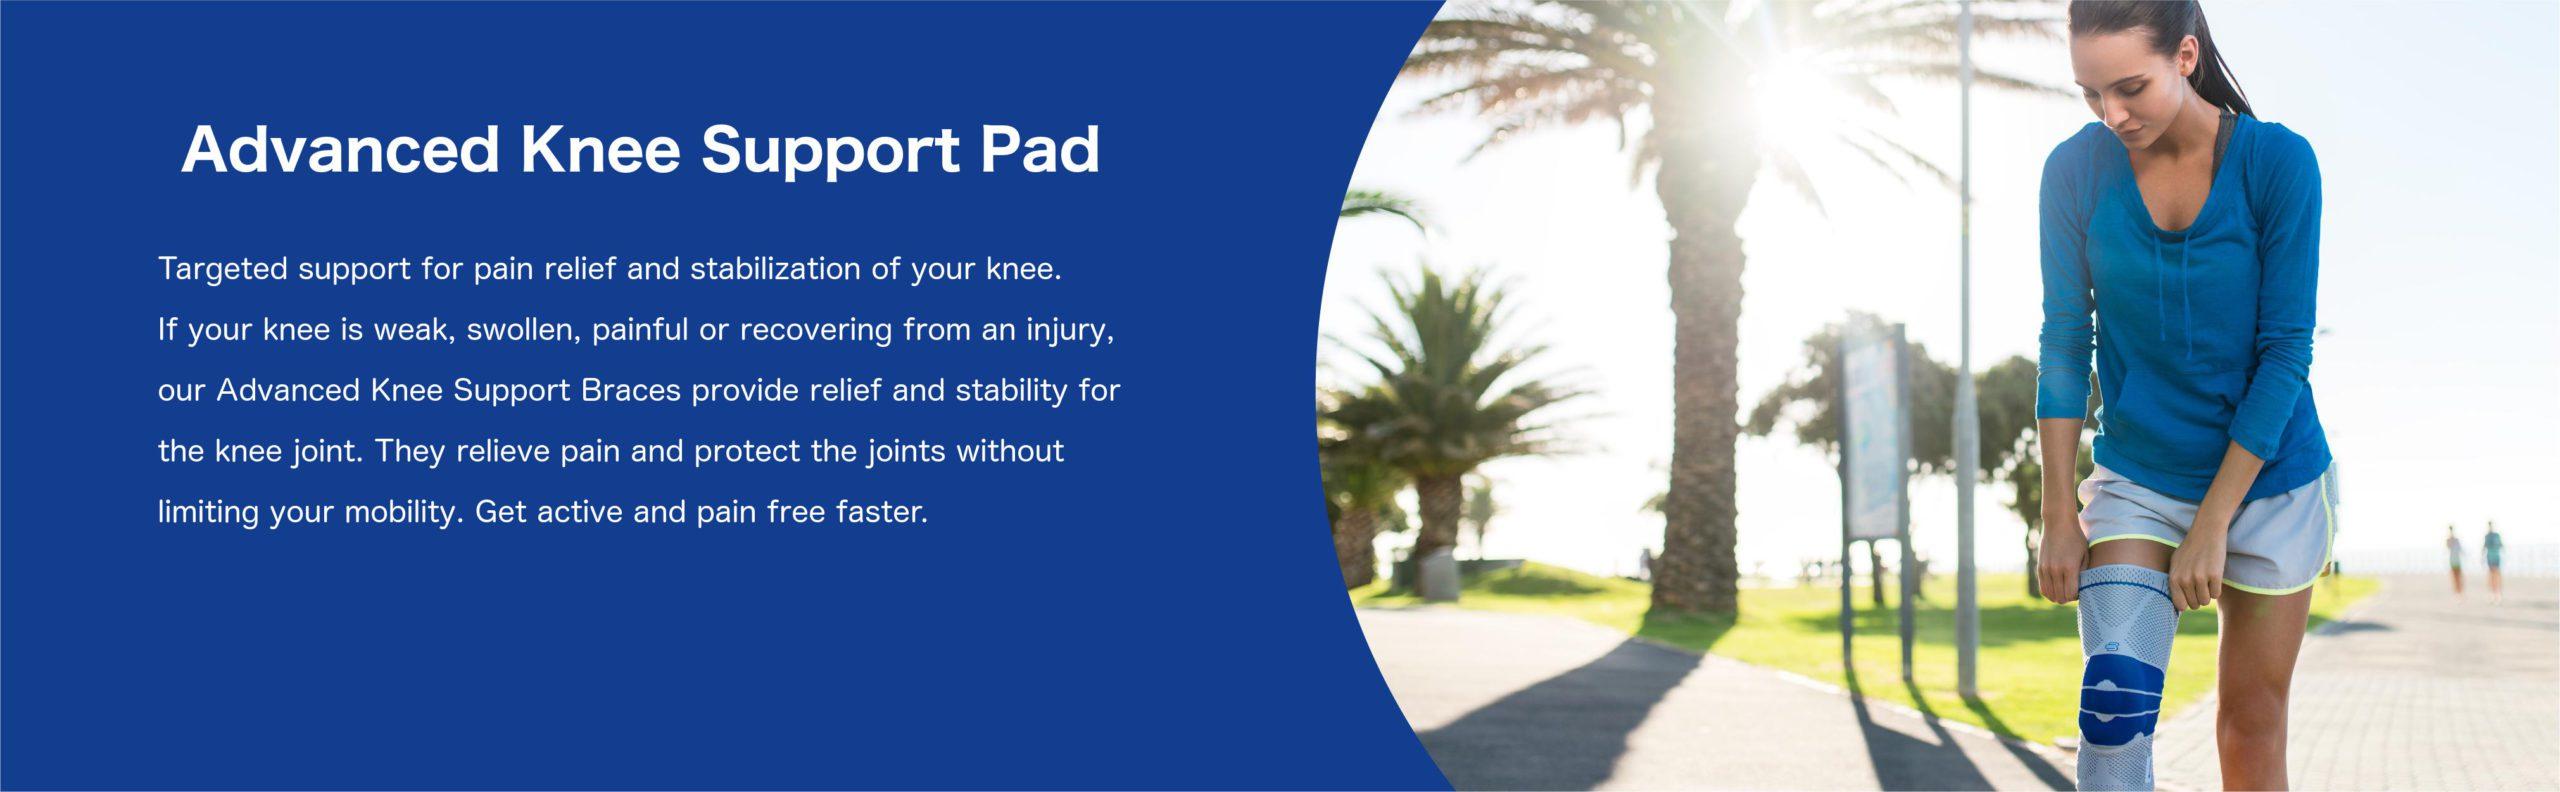 all activity advanced knee support brace description text